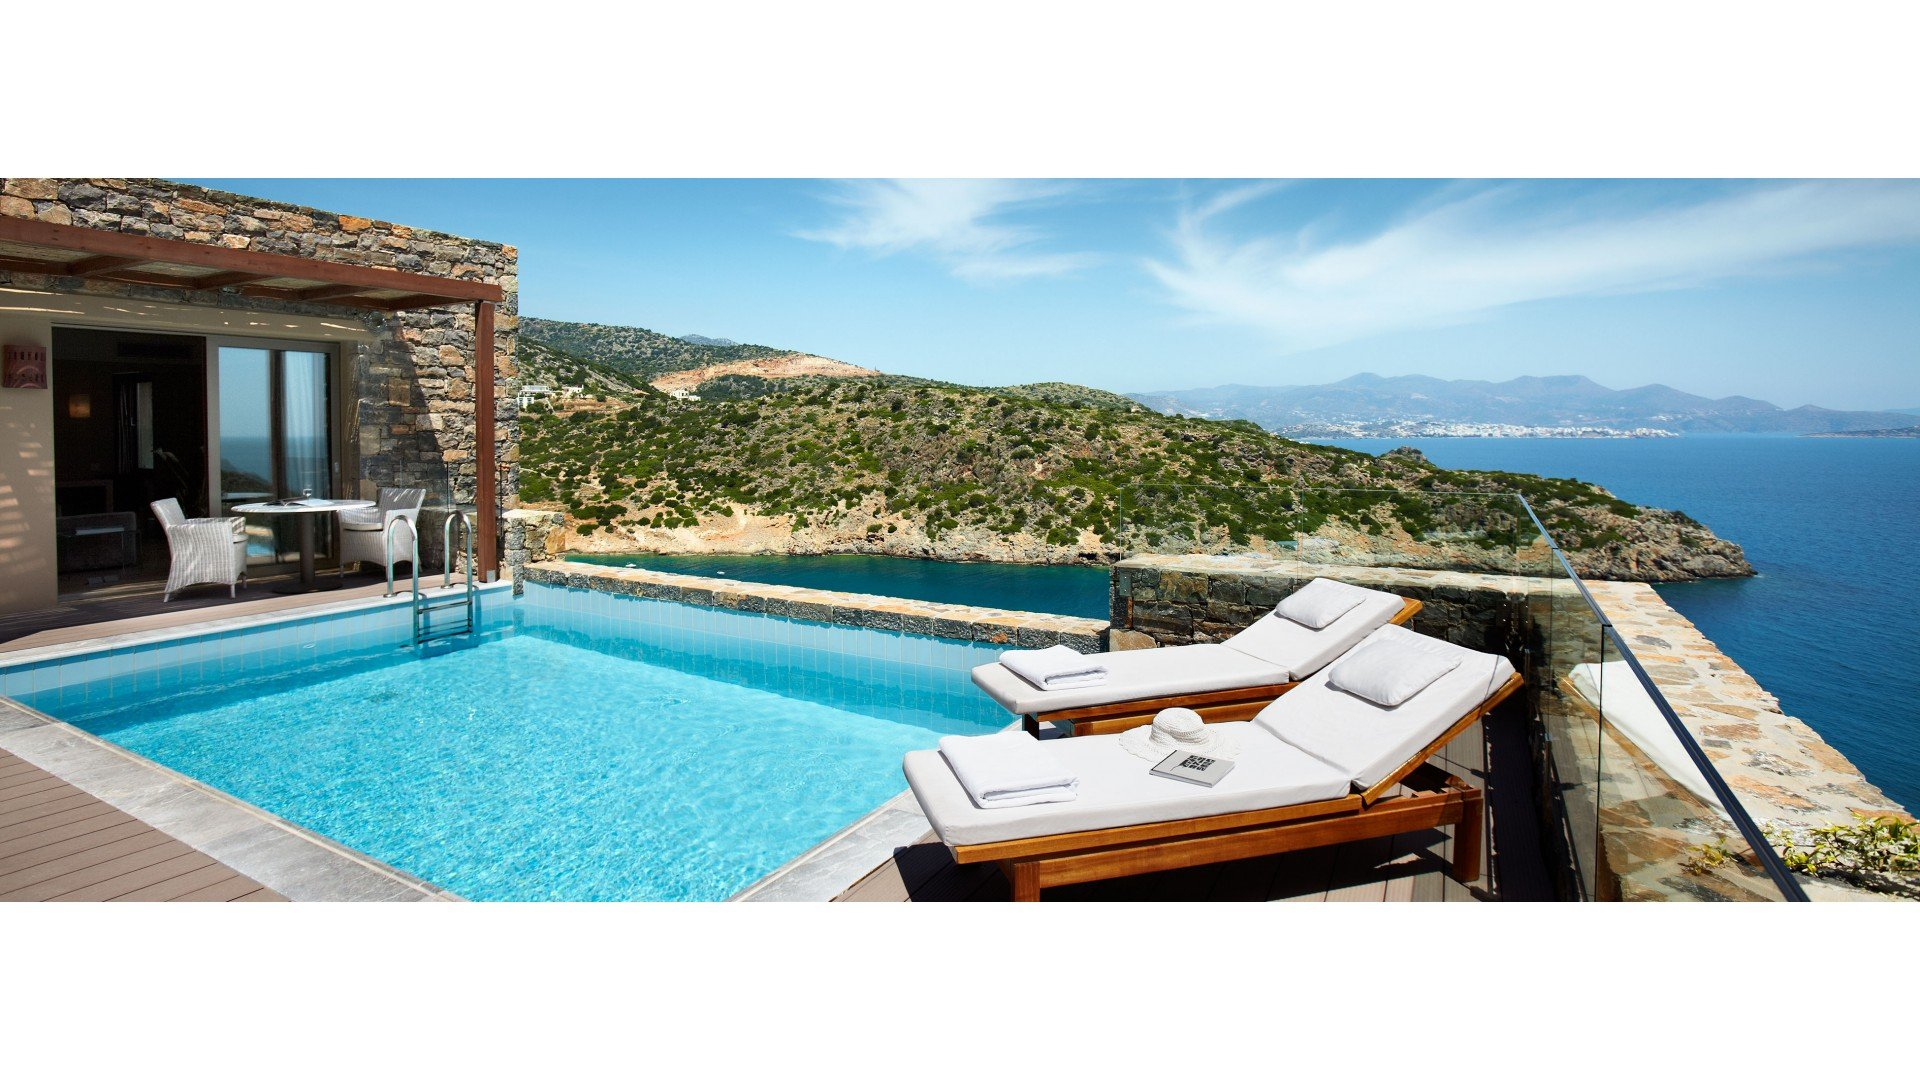 Image result for daios Cove Luxury Resort & Villa